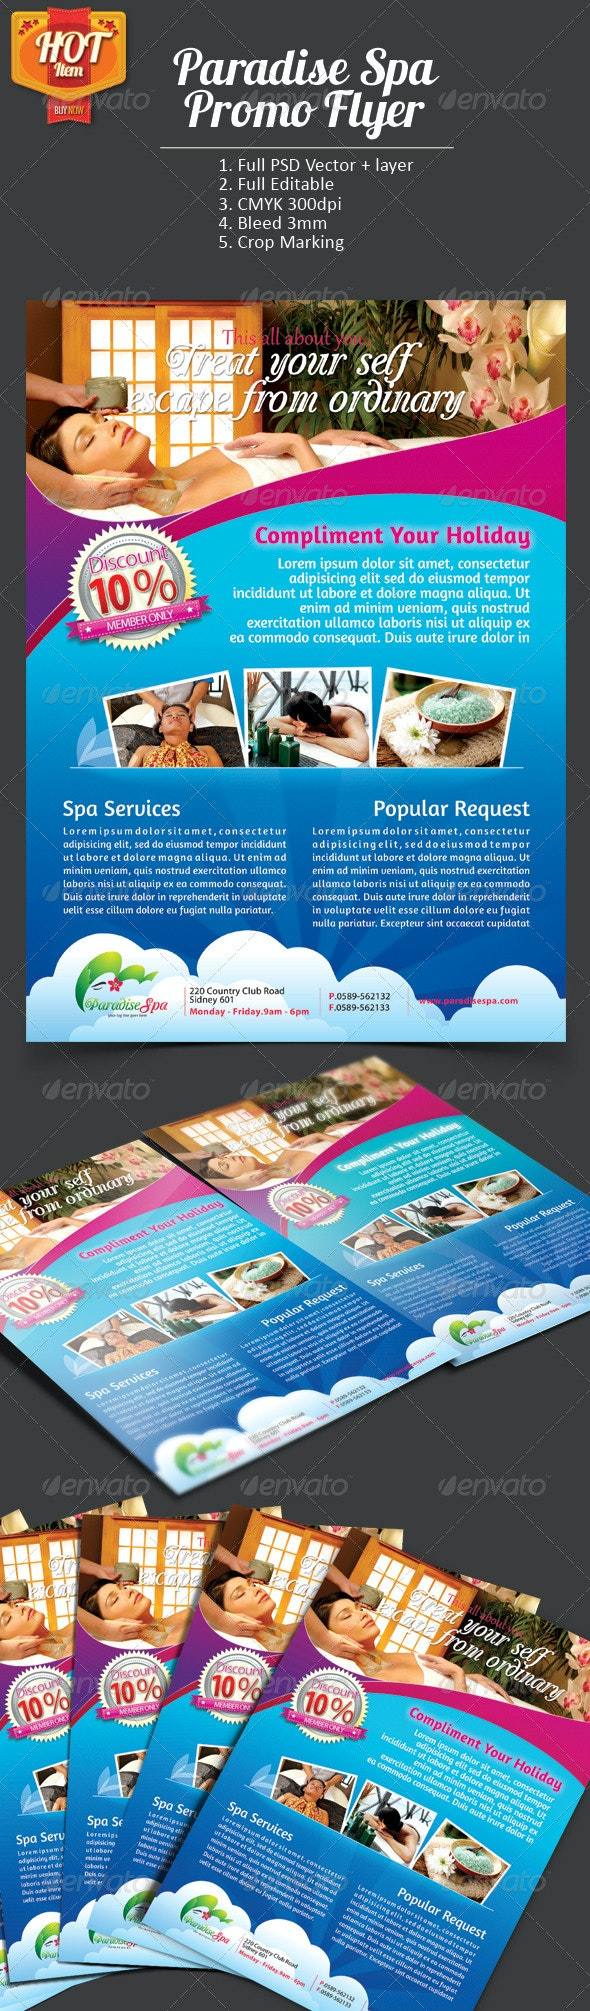 Paradise Spa Promo Flyer - Commerce Flyers